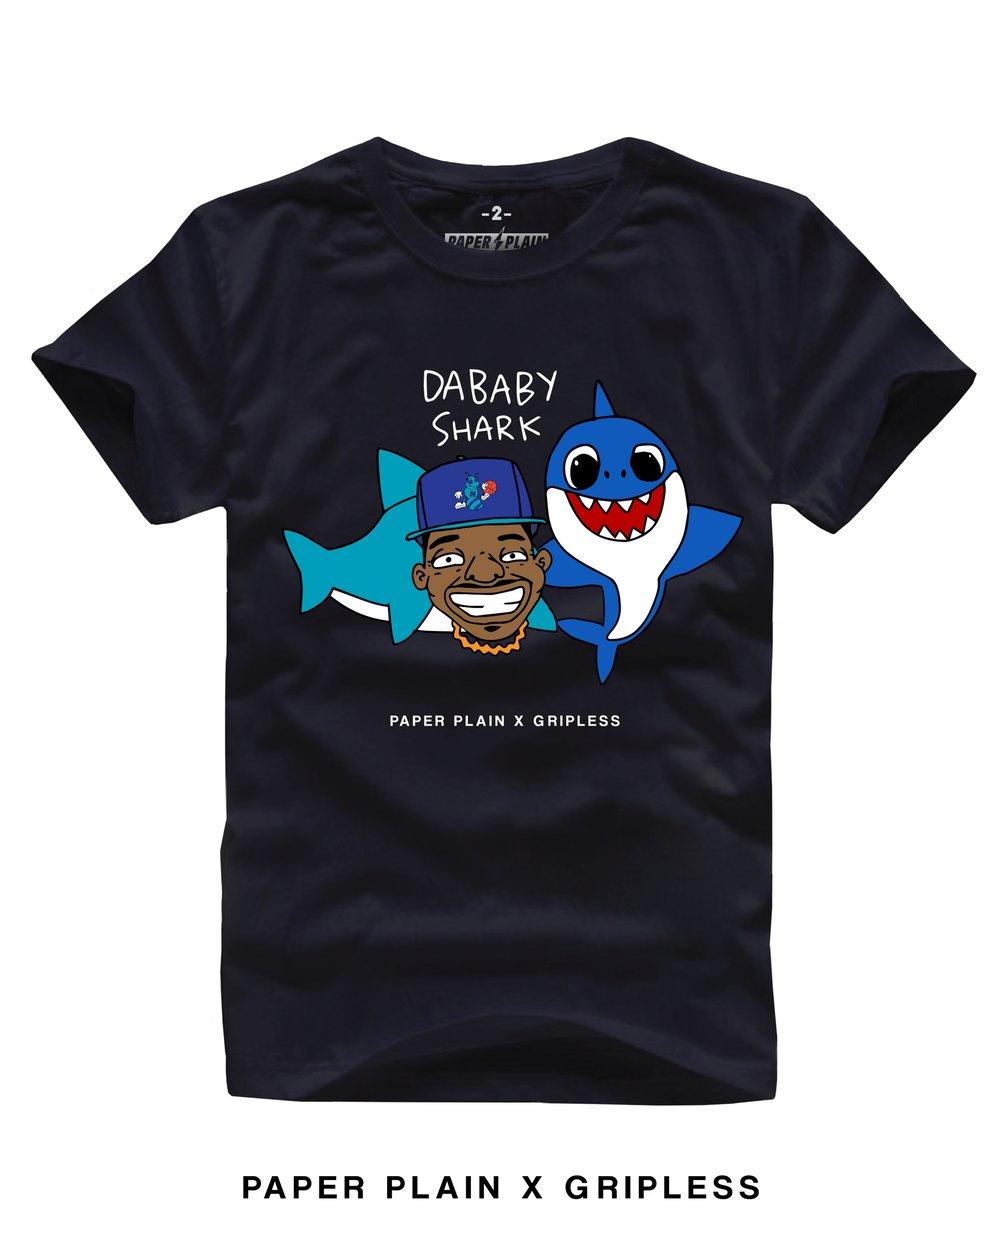 DA BABY SHARK TEE BLACK (GRIPLESS COLLAB)